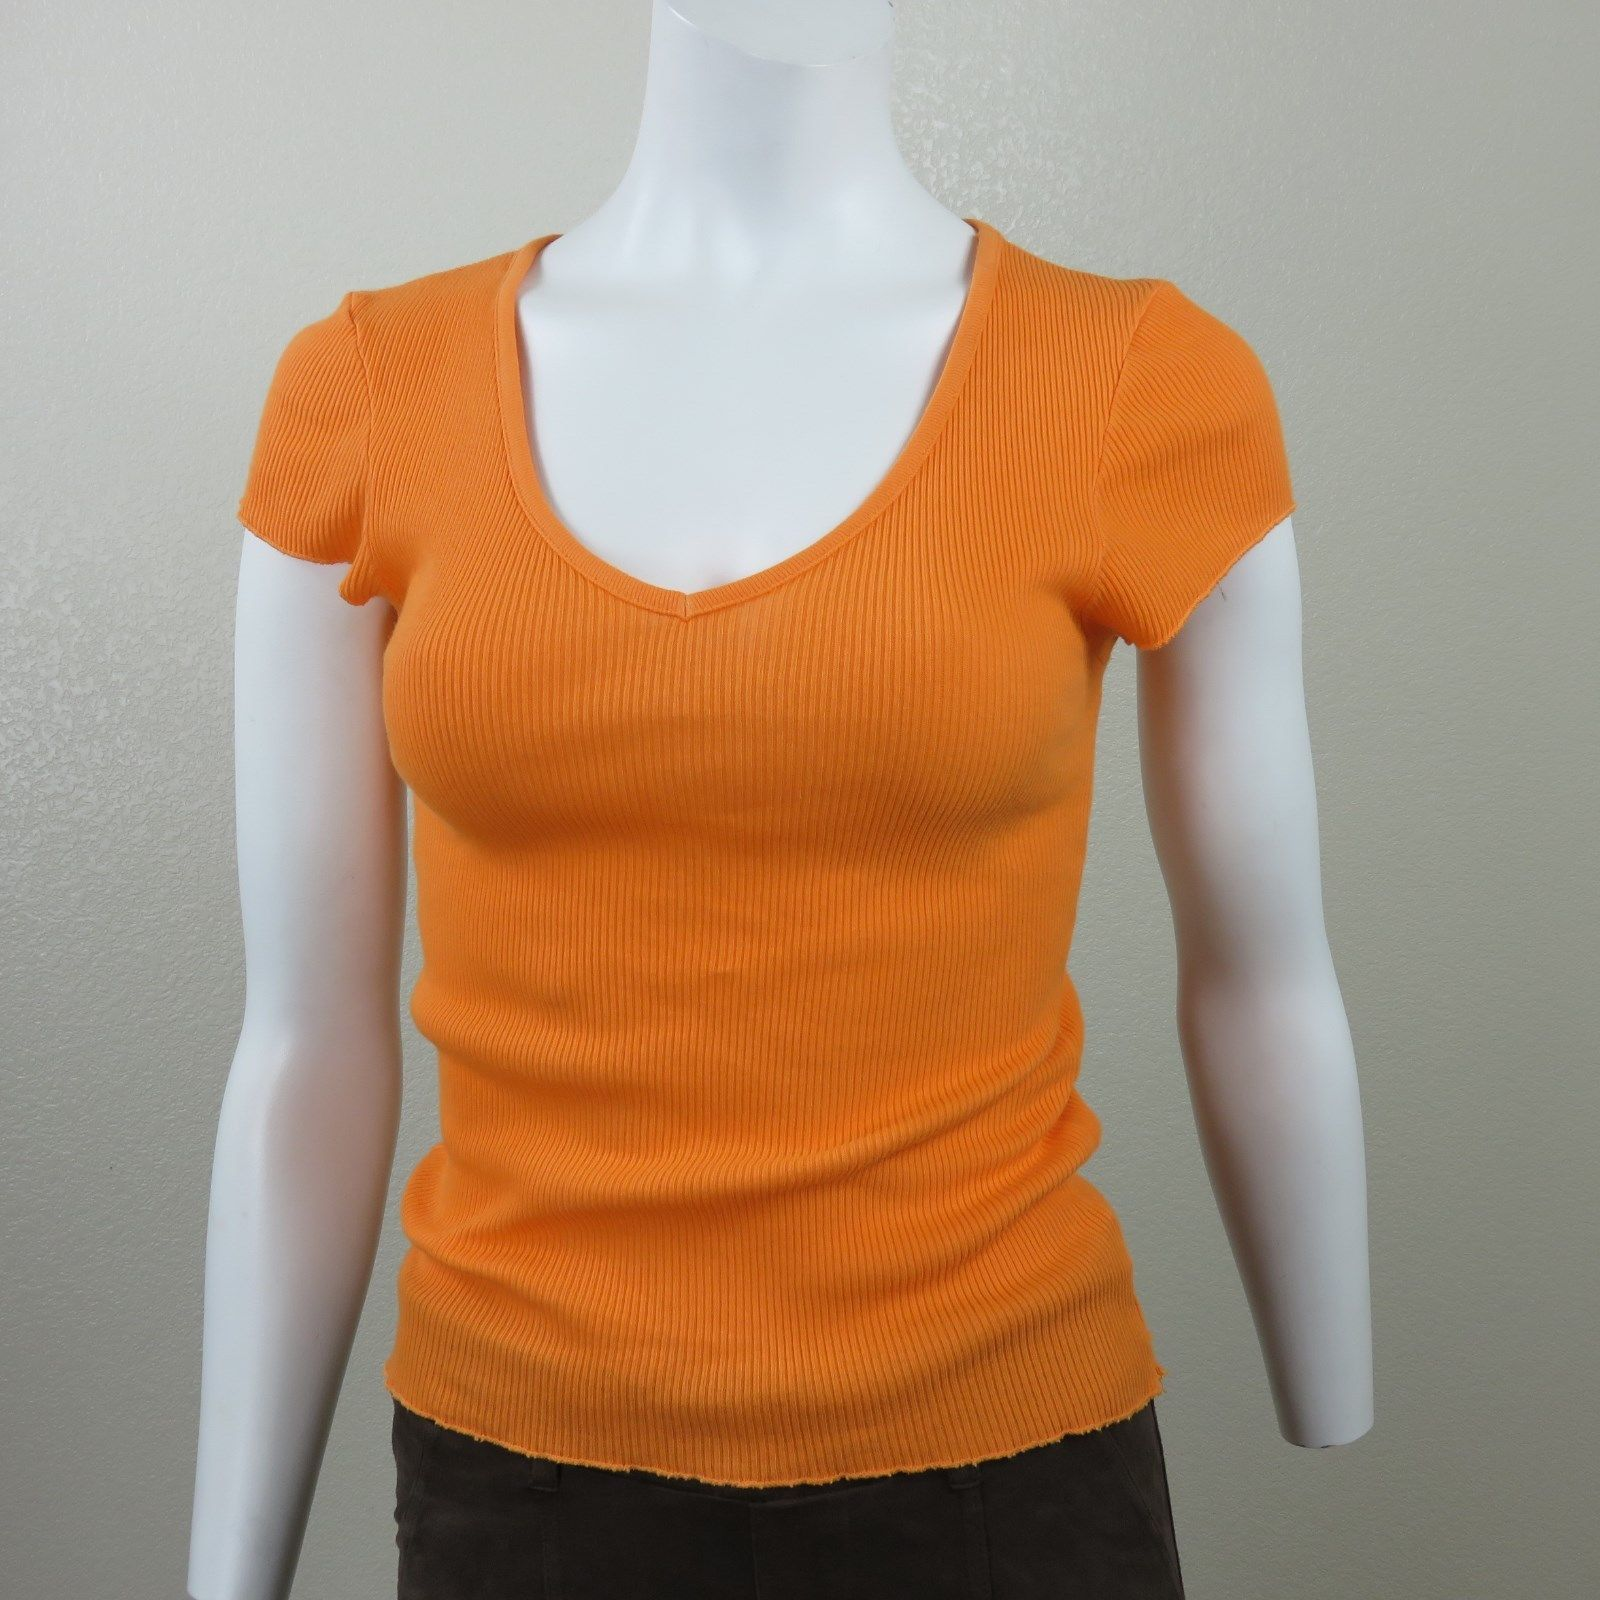 dbd8ecb745 S l1600. S l1600. Previous. New Michael Stars Orange Stretch Cotton Tee Top  One Size Fits Cap Sleeve ...